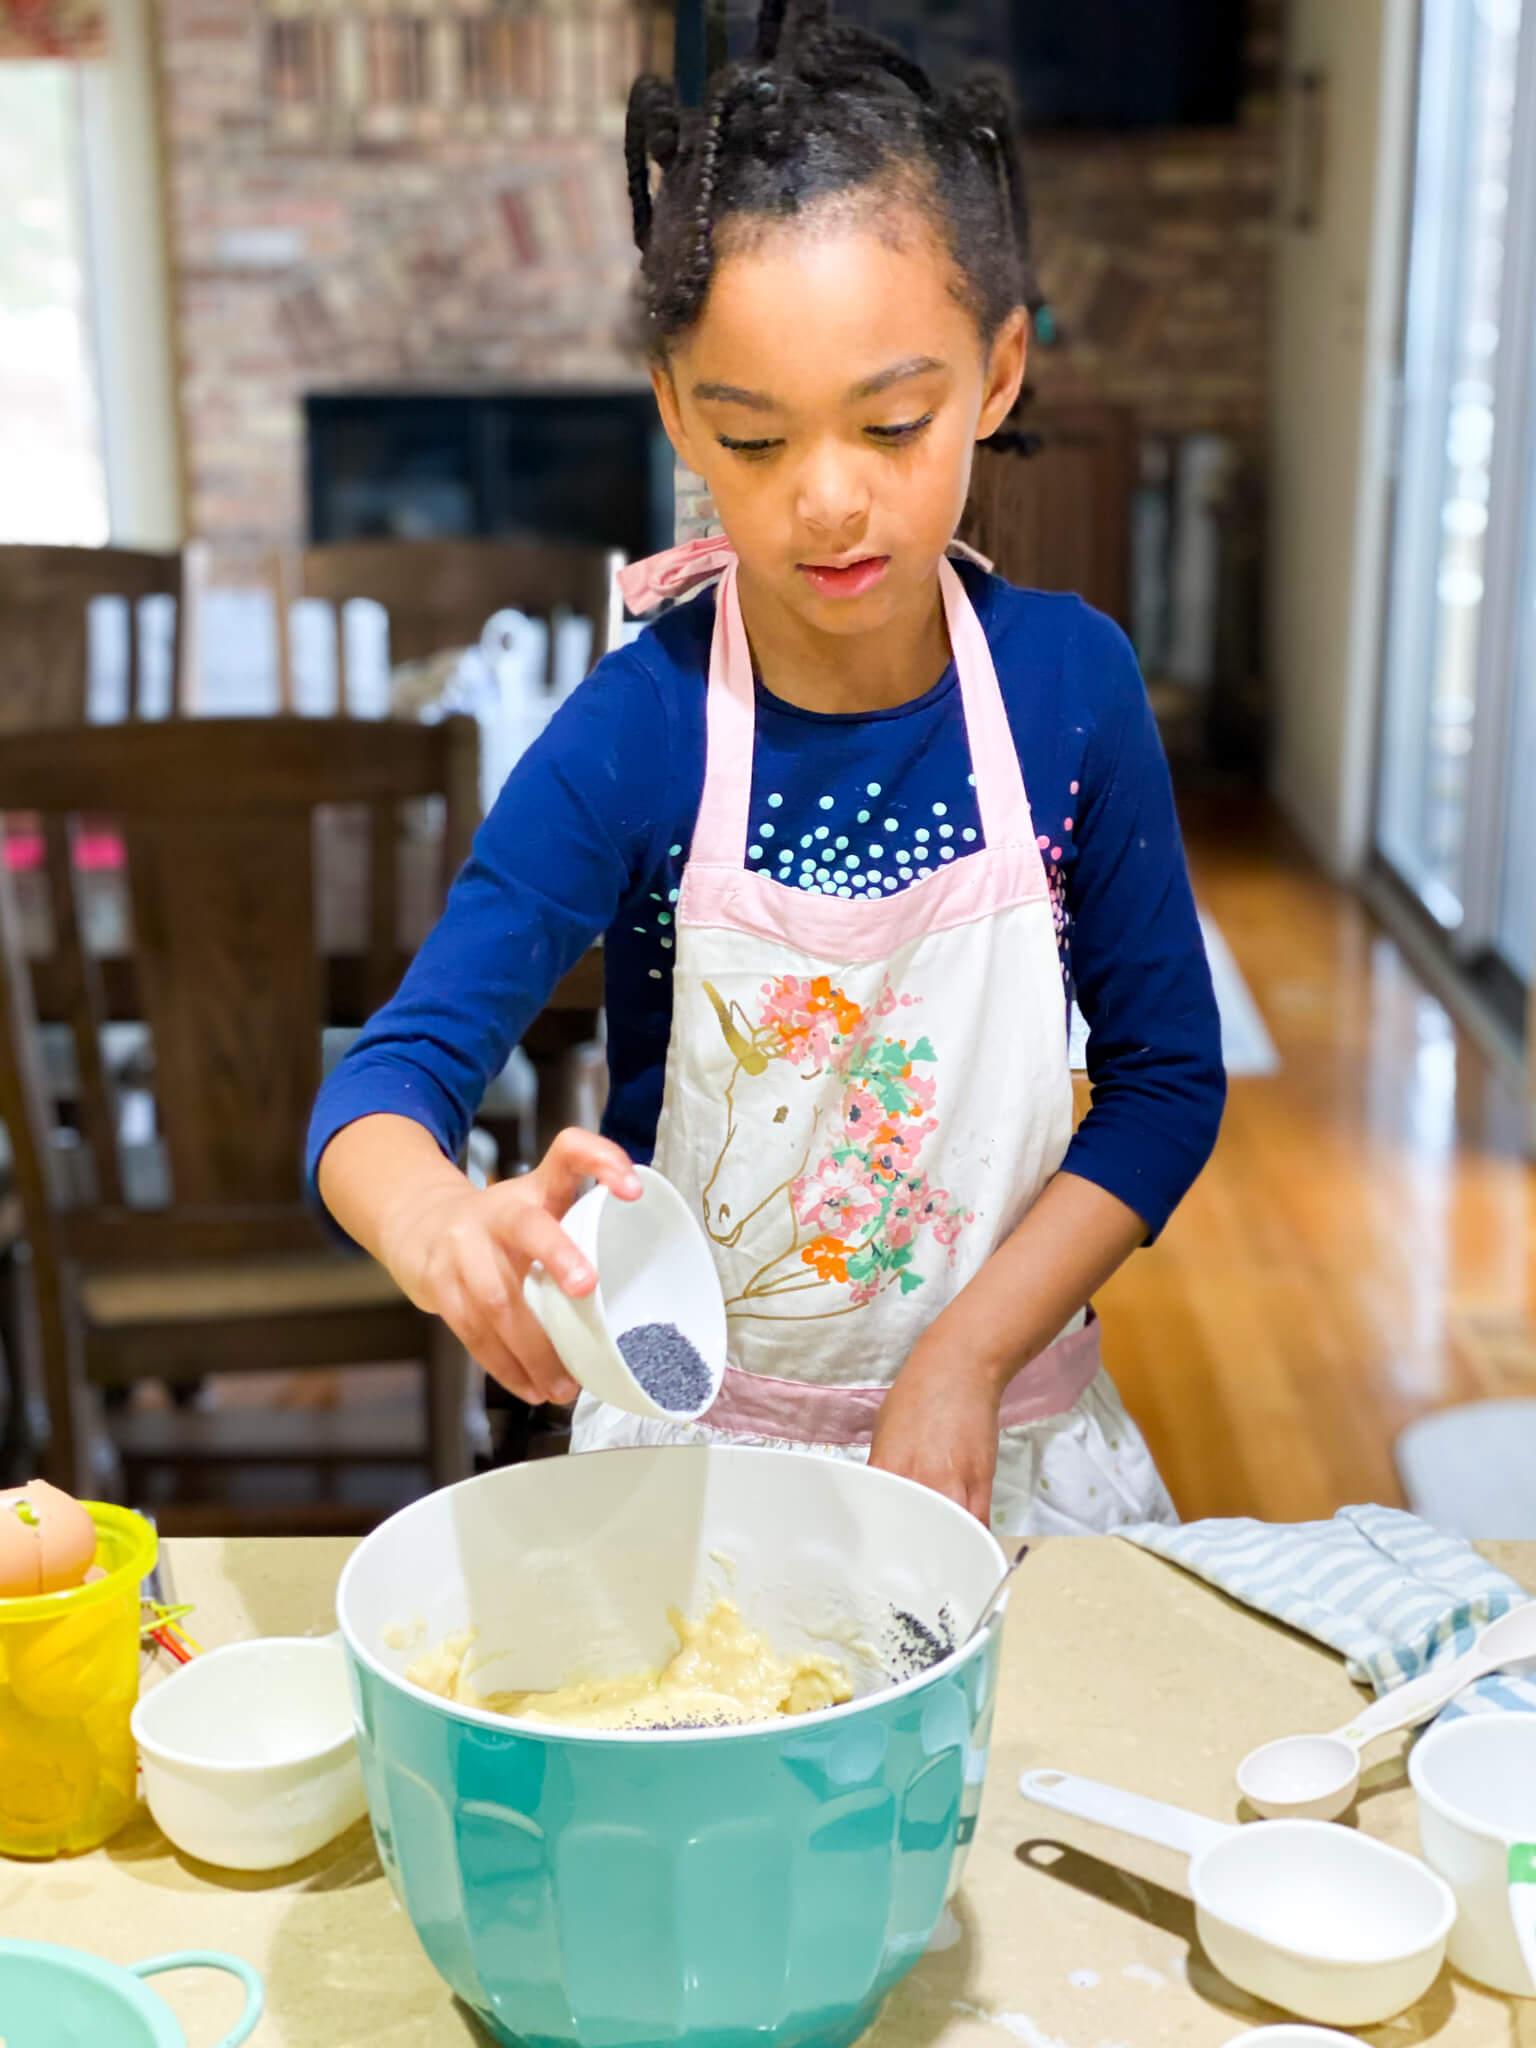 Gluten and Dairy-Free Almond Poppy Seed Sheet Cake Recipe agutsygirl.com #glutenfreerecipe #dairyfreerecipe #glutenfreedairyfree #poppyseed Samarah